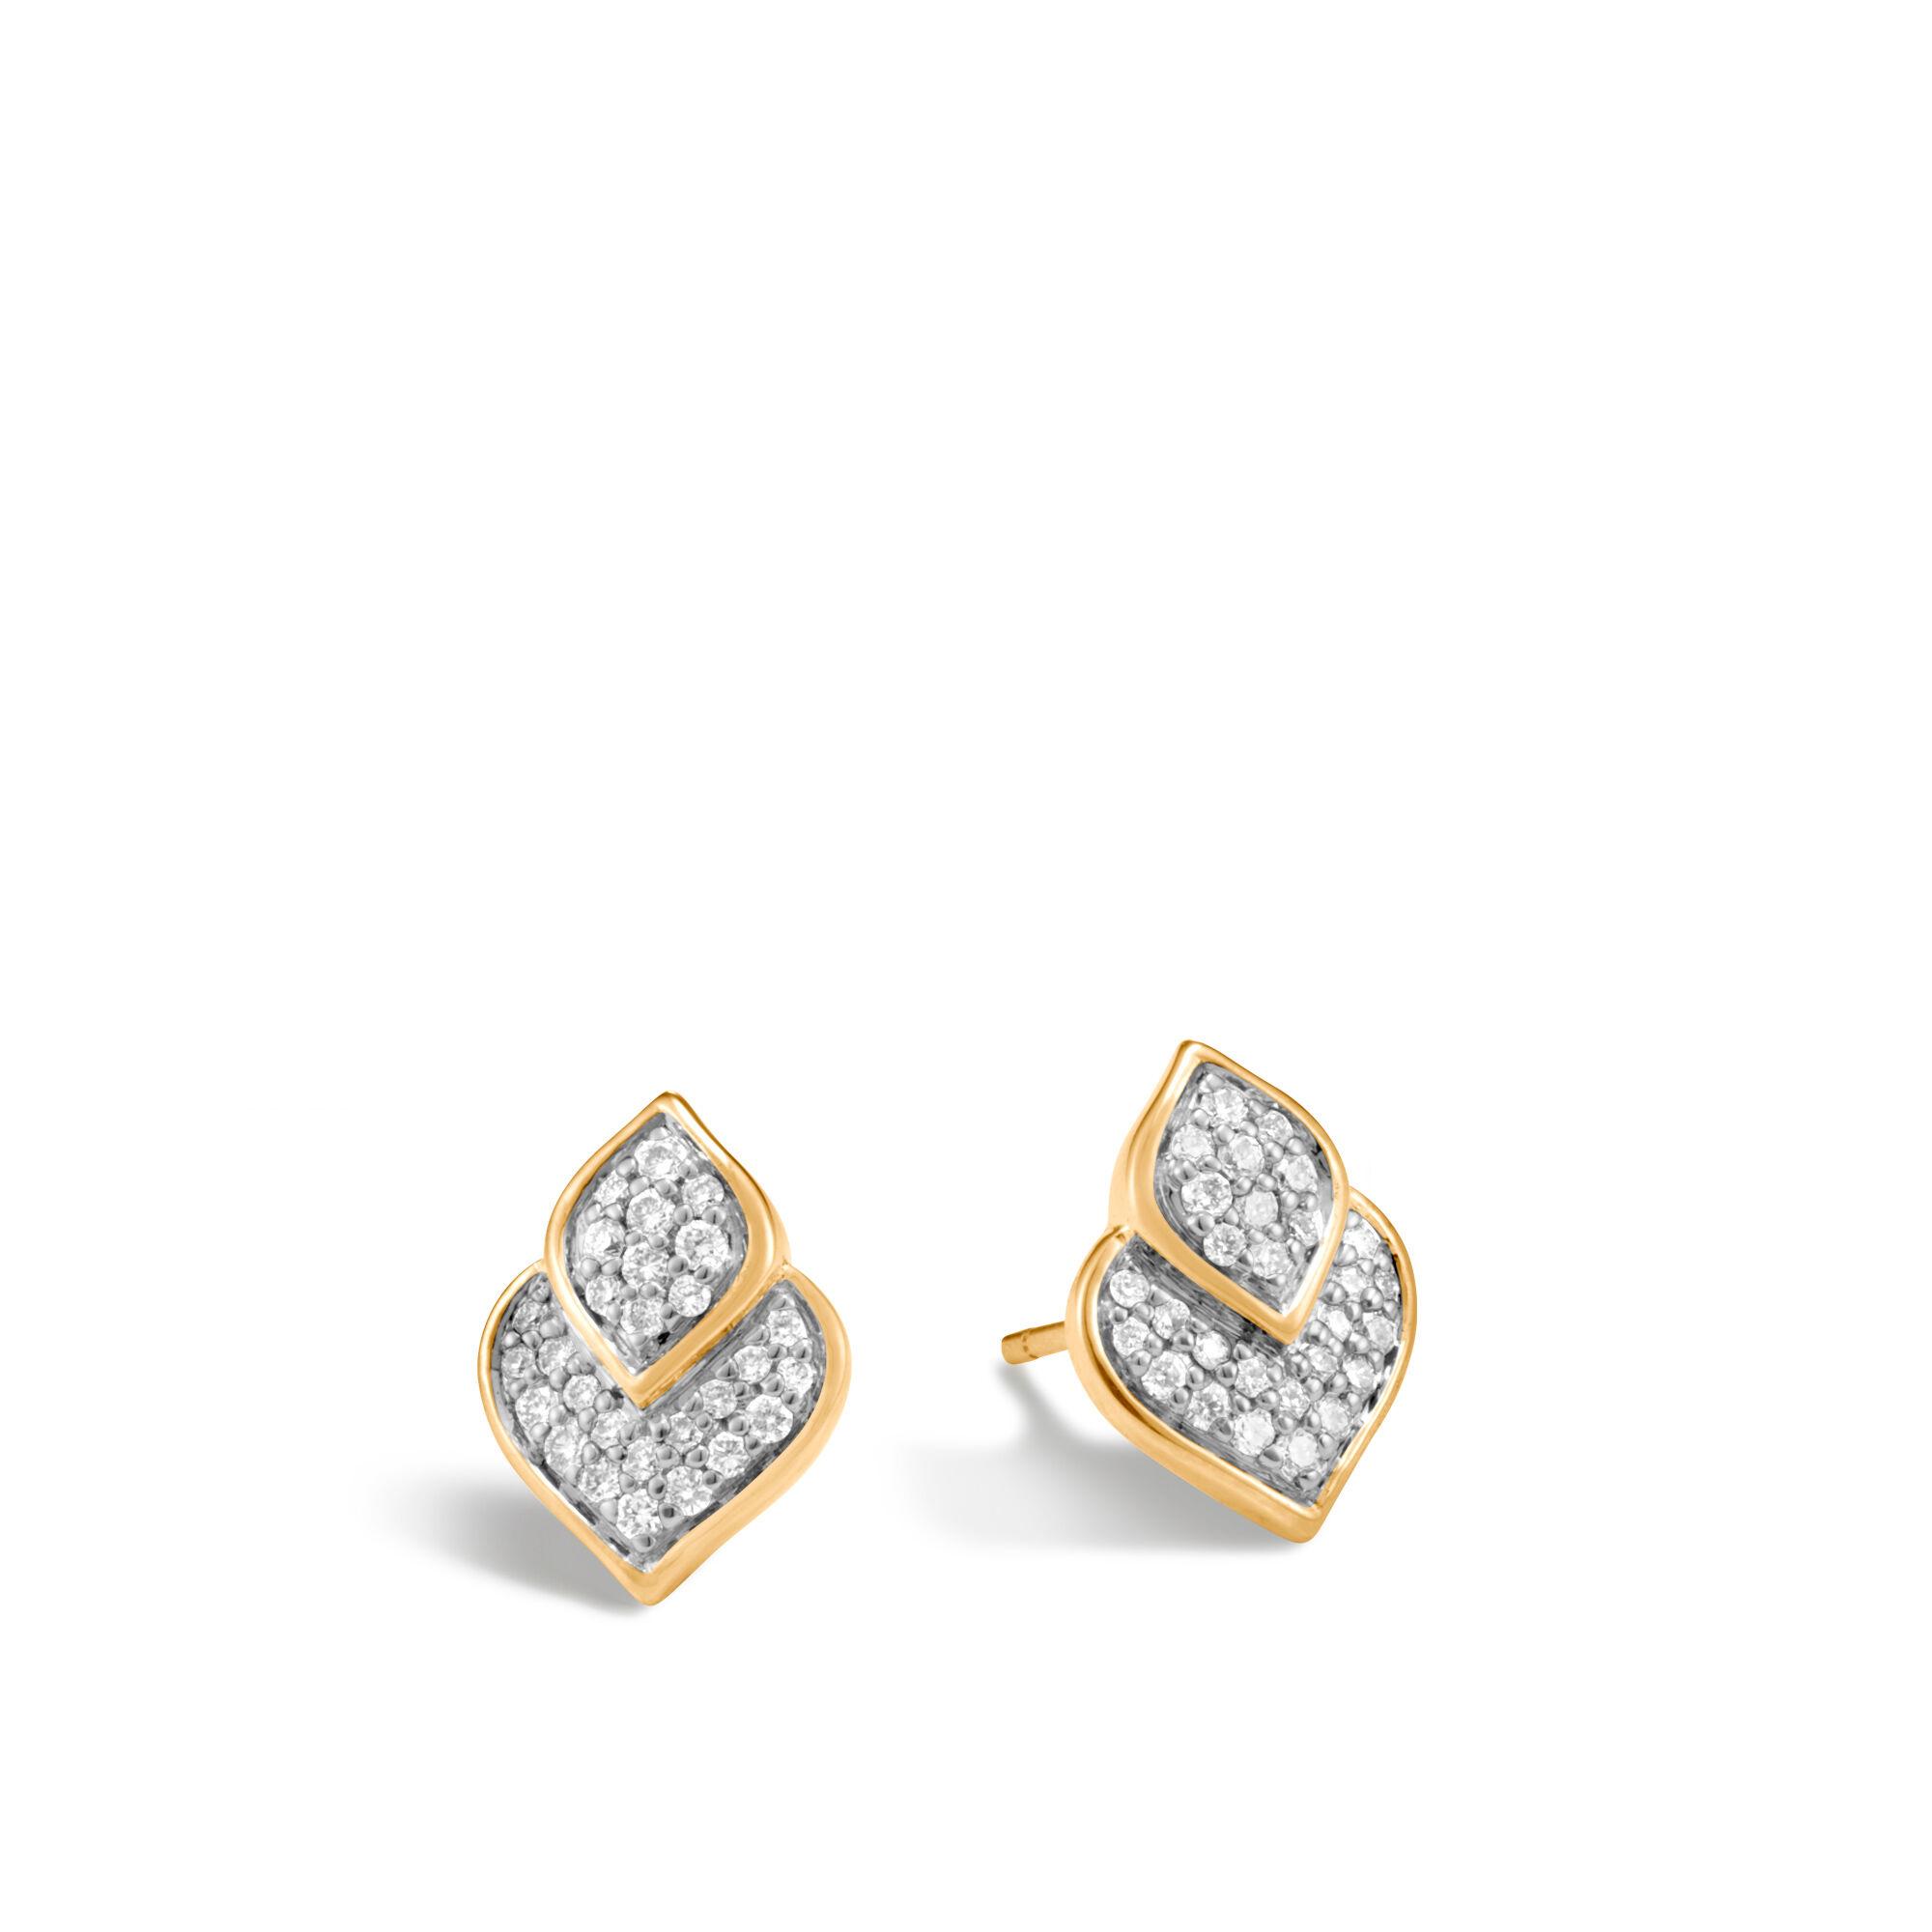 John Hardy Legends Naga 18K Gold & Silver Stud Earrings Ms6aqiJv